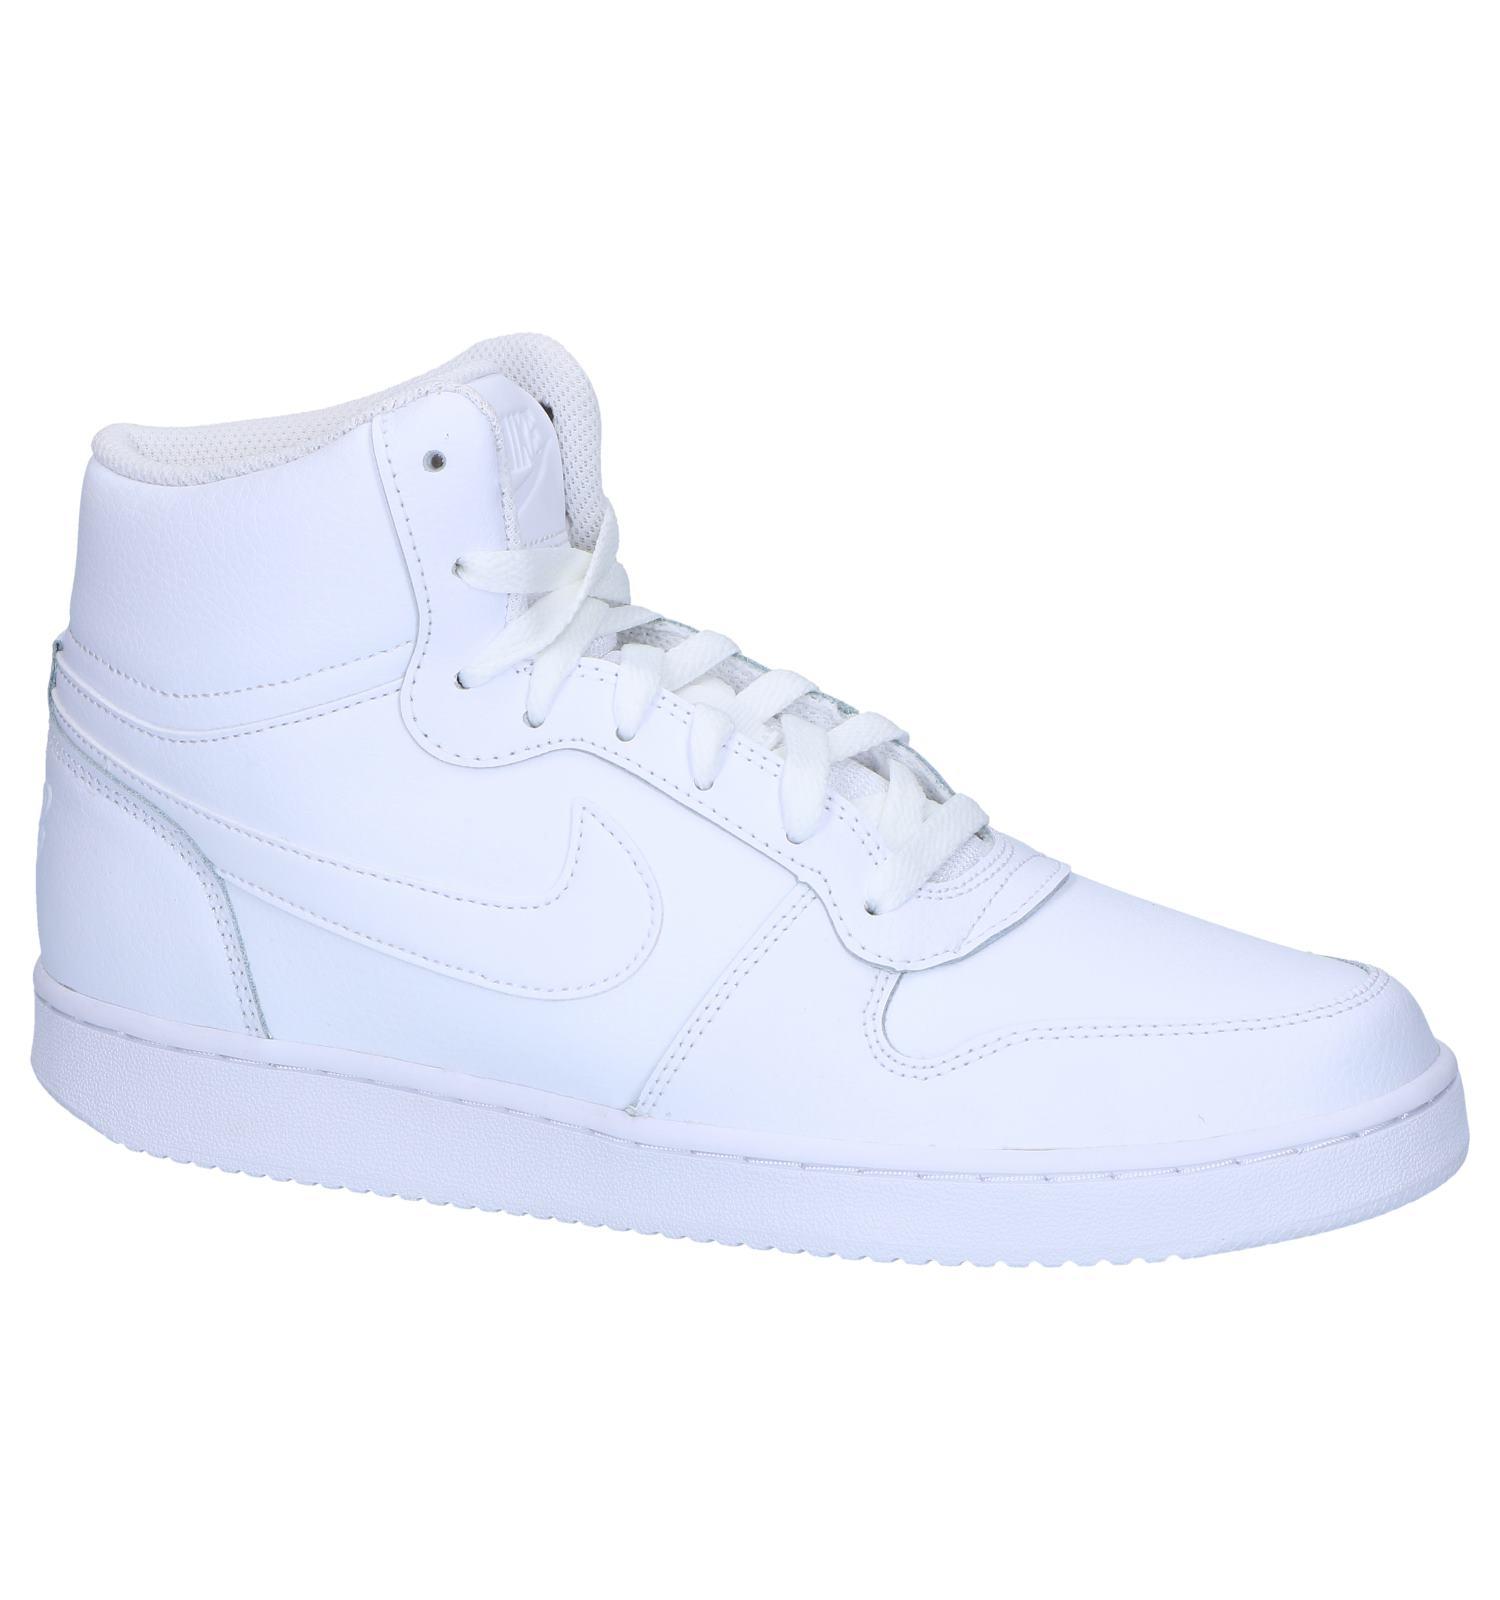 new product 1f62f 9dd27 Witte Sneakers Nike Ebernon Mid   TORFS.BE   Gratis verzend en retour